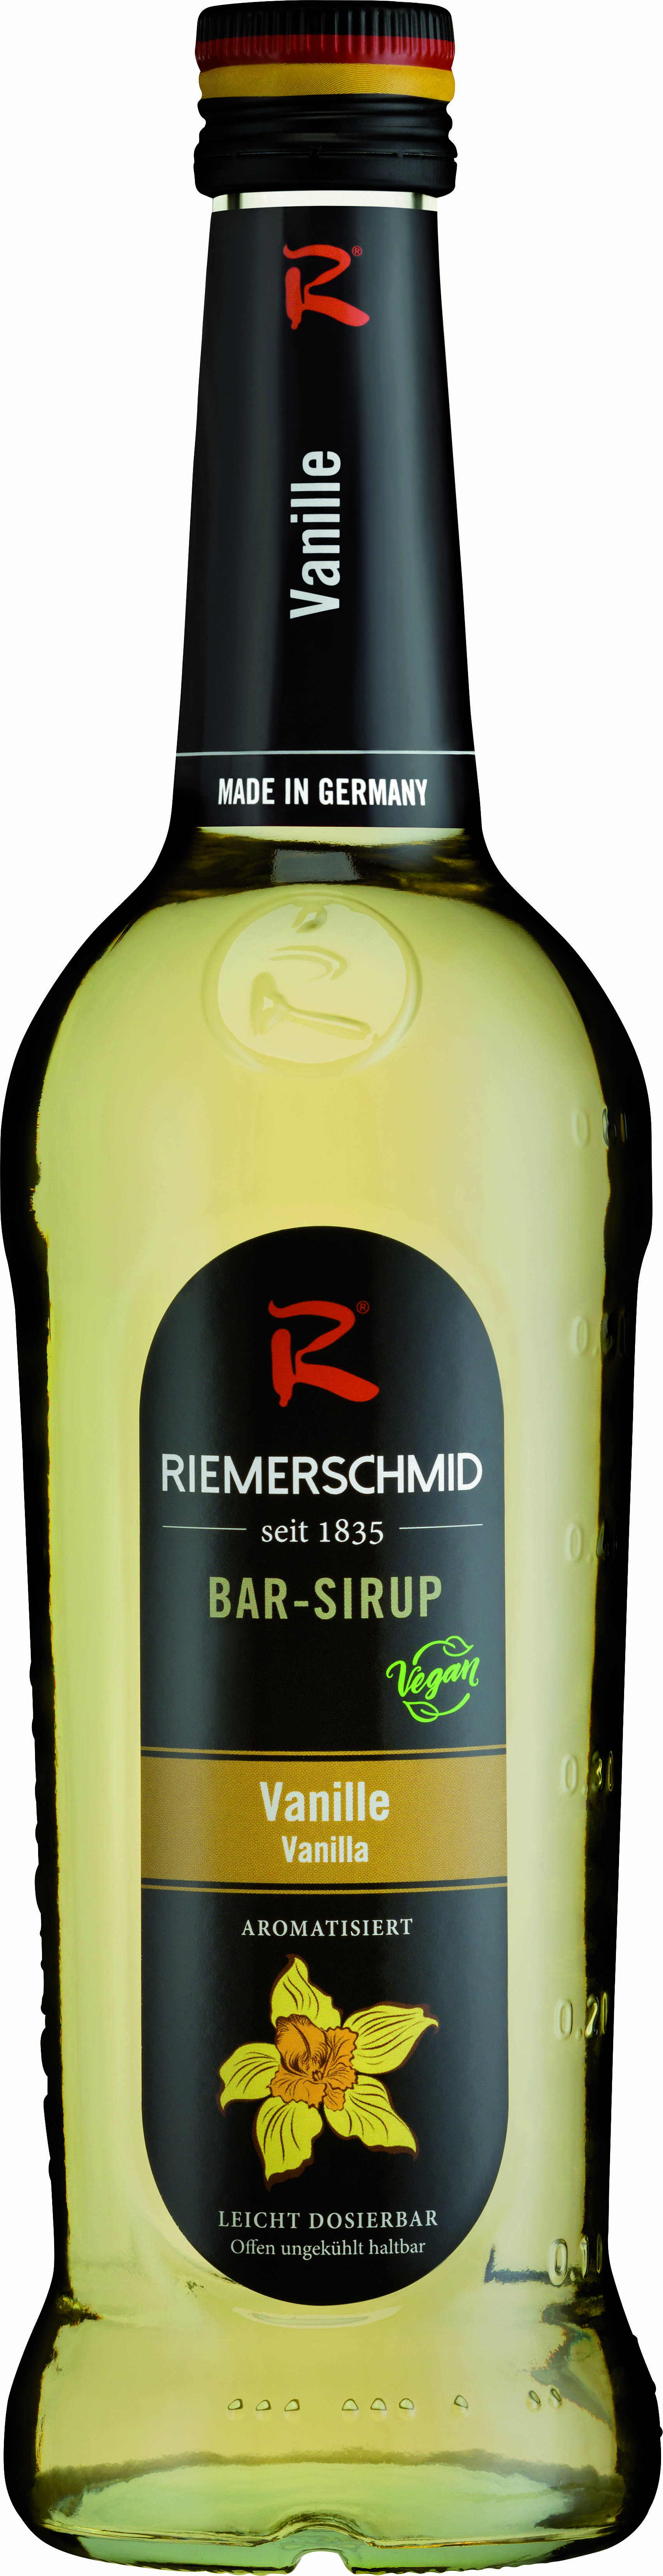 Bar Sirup Kaufen